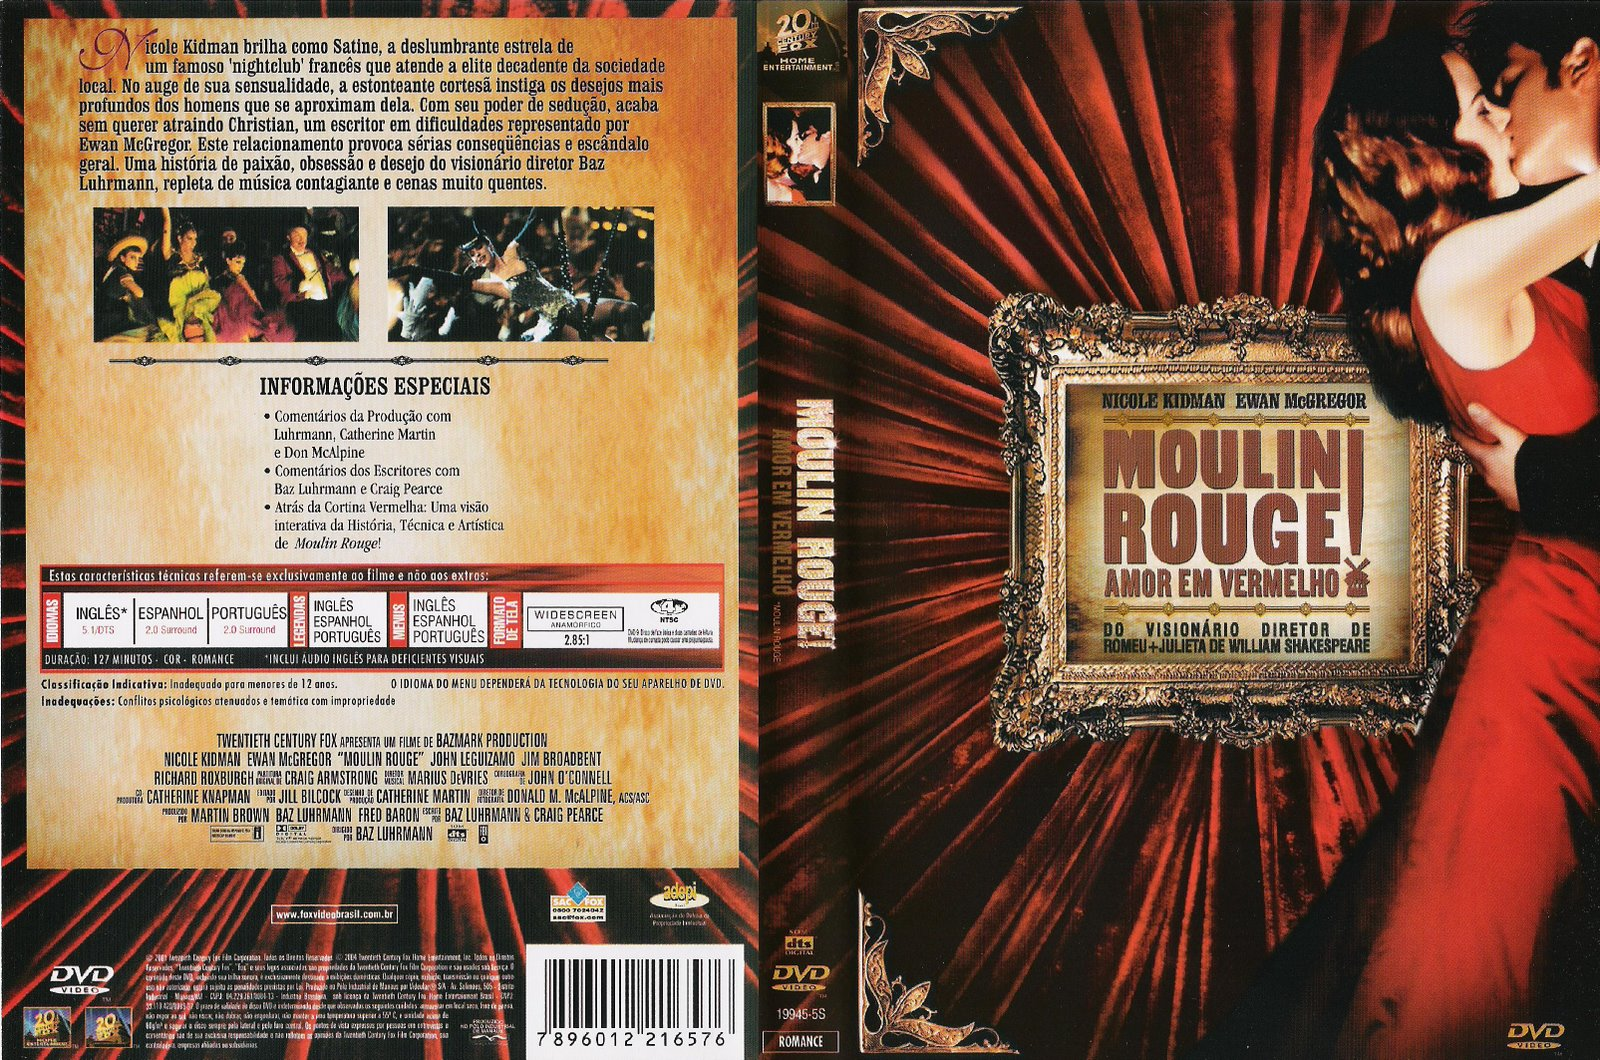 http://4.bp.blogspot.com/_JgyO81qzogk/TDSwq06KgZI/AAAAAAAAABs/ucPkT_YEjEY/s1600/Moulin_Rouge.jpg